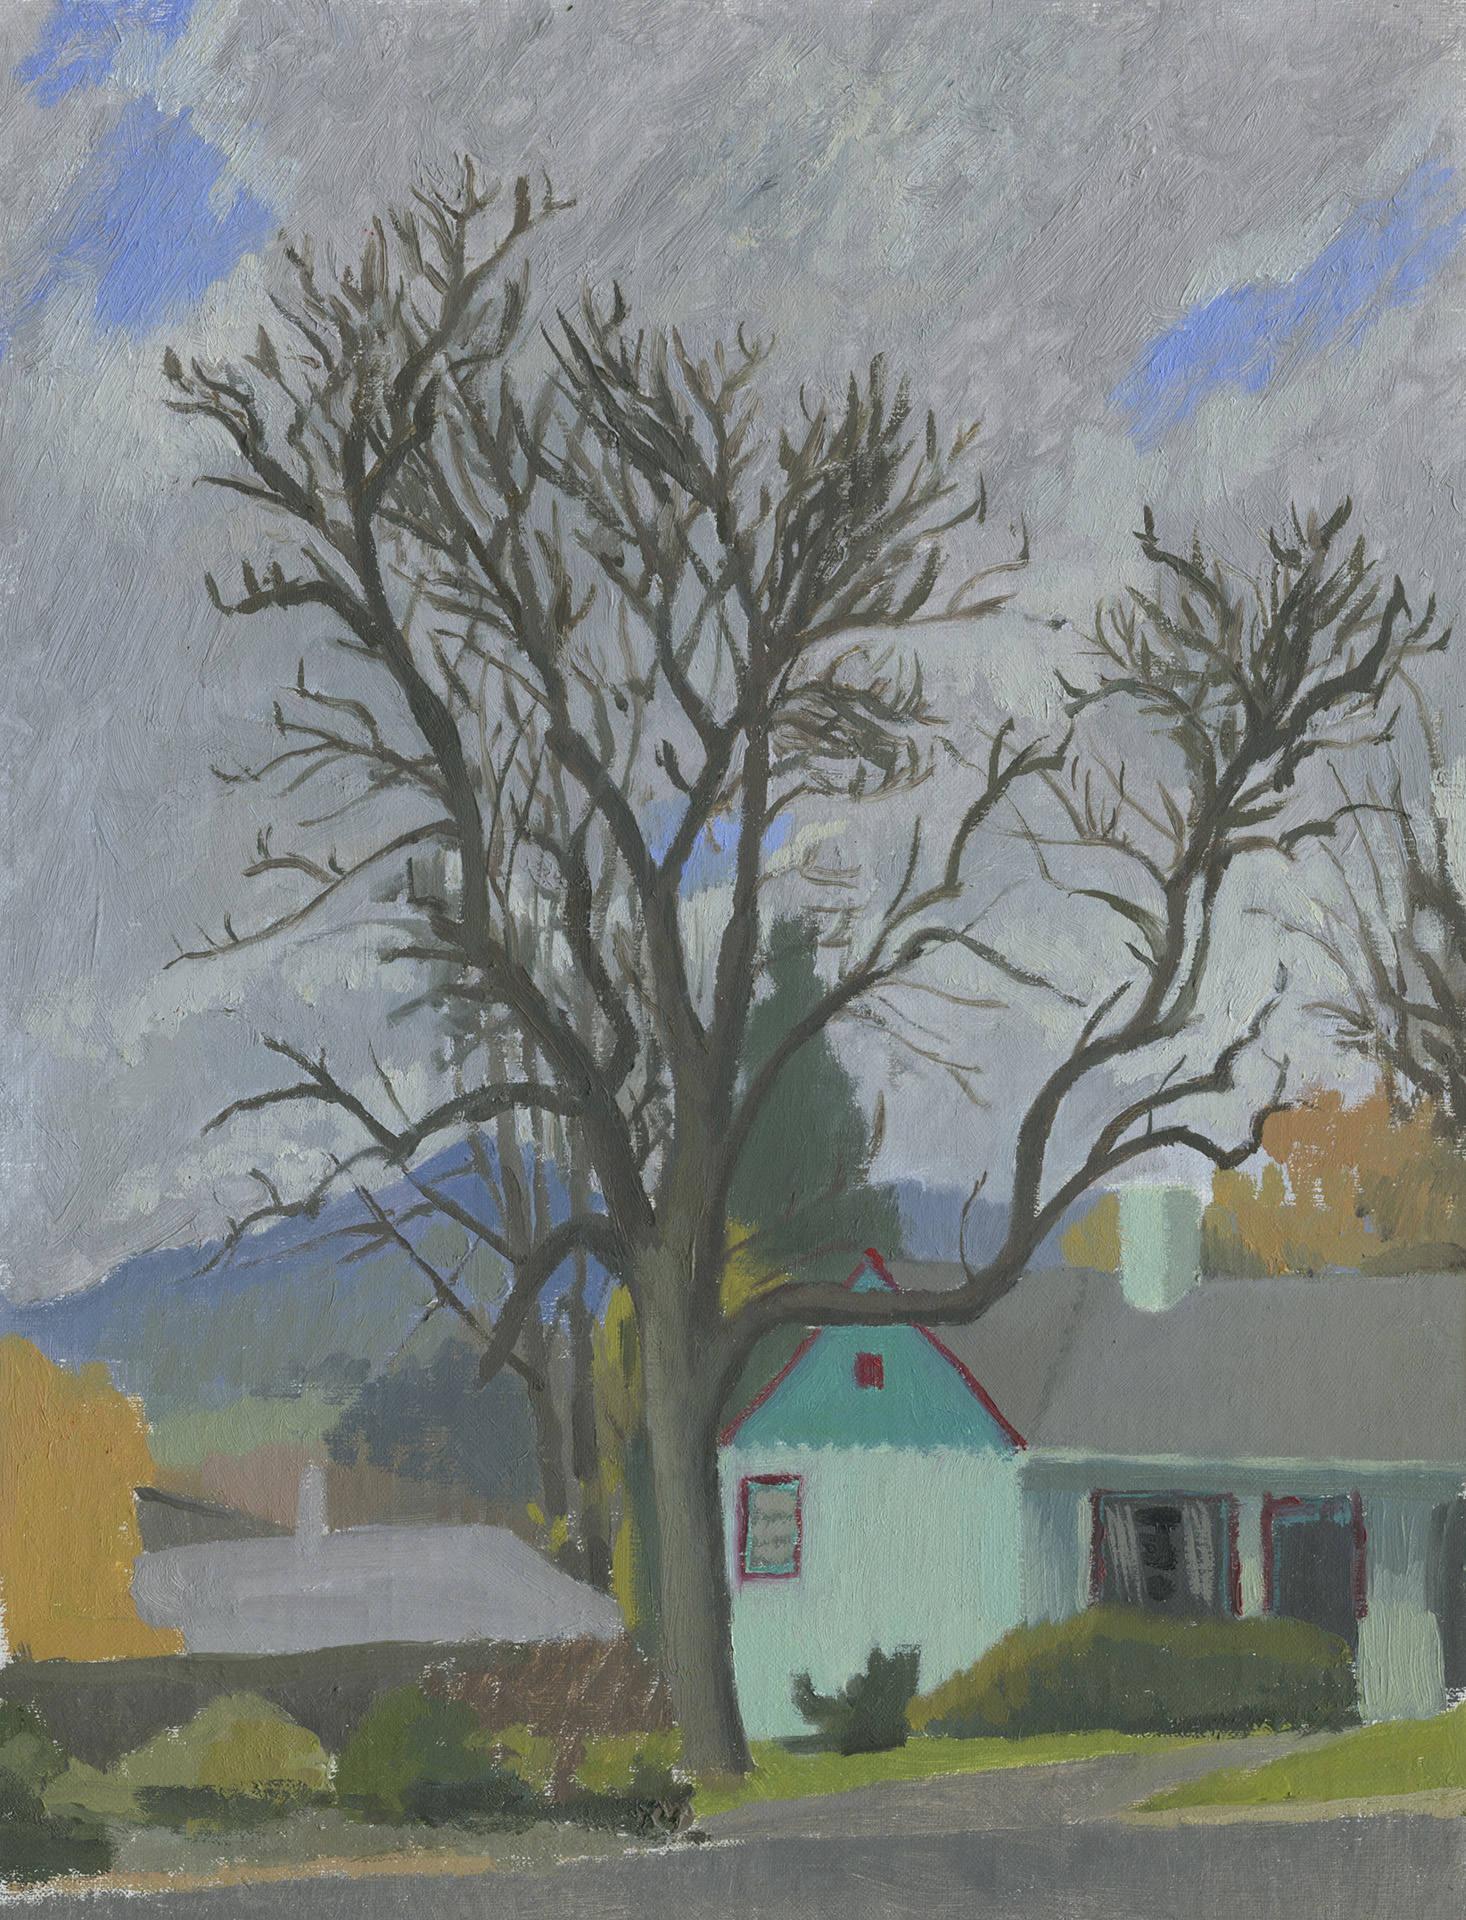 arbre hiver voisin paysage de plein air original peinture. Black Bedroom Furniture Sets. Home Design Ideas